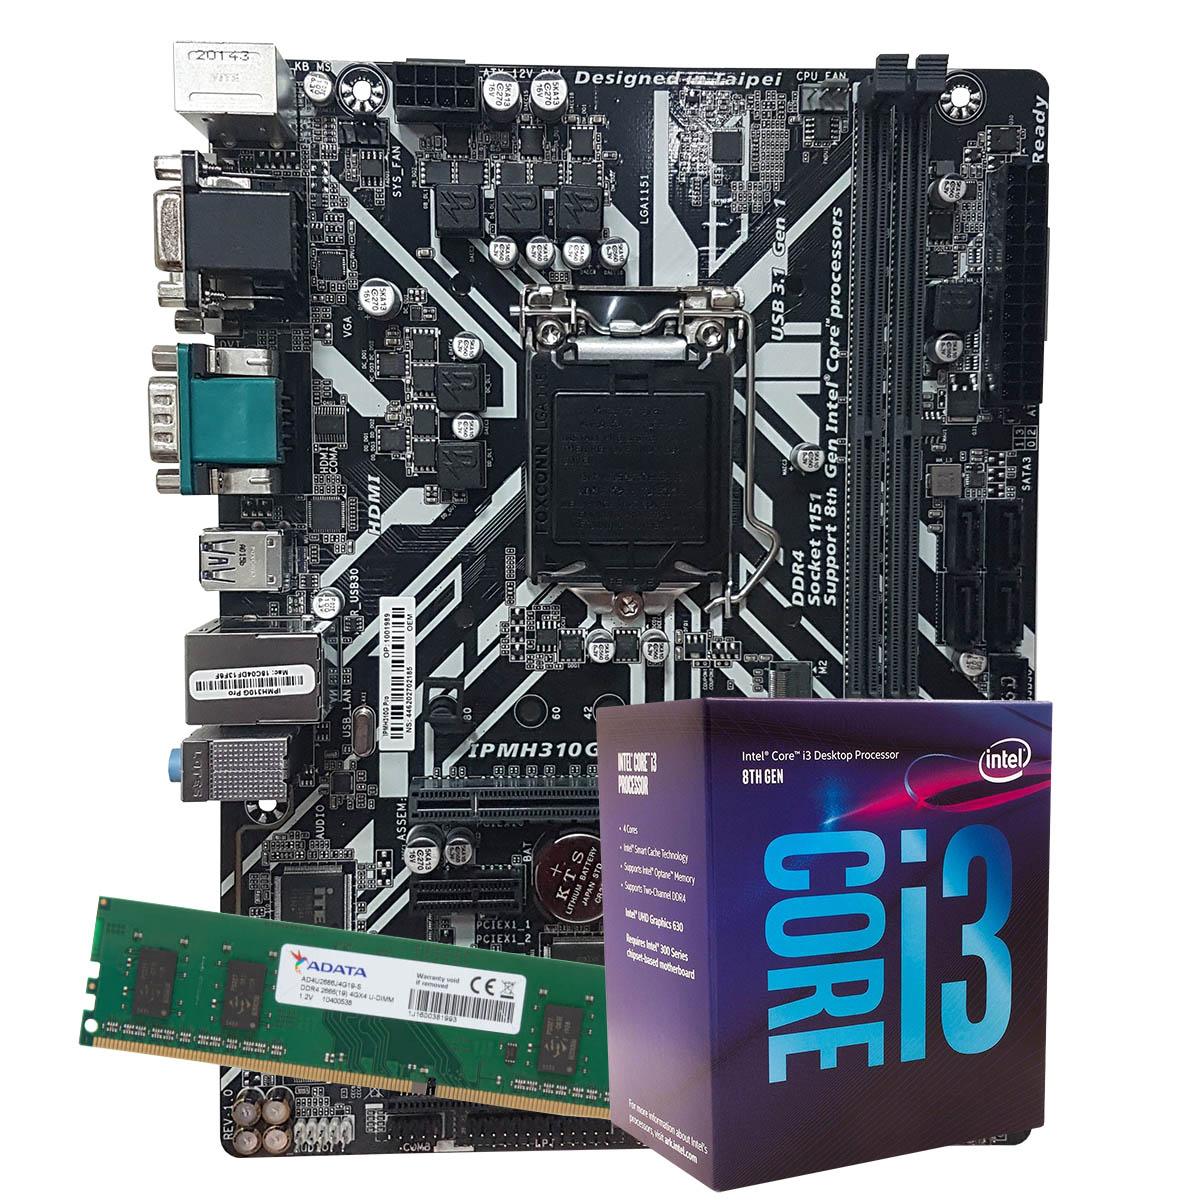 Kit Upgrade intel Corei3-8100 3.6Ghz, Placa Mãe Pcware IPMH310G PRO LGA 1151,  Memoria 4GB DDR4